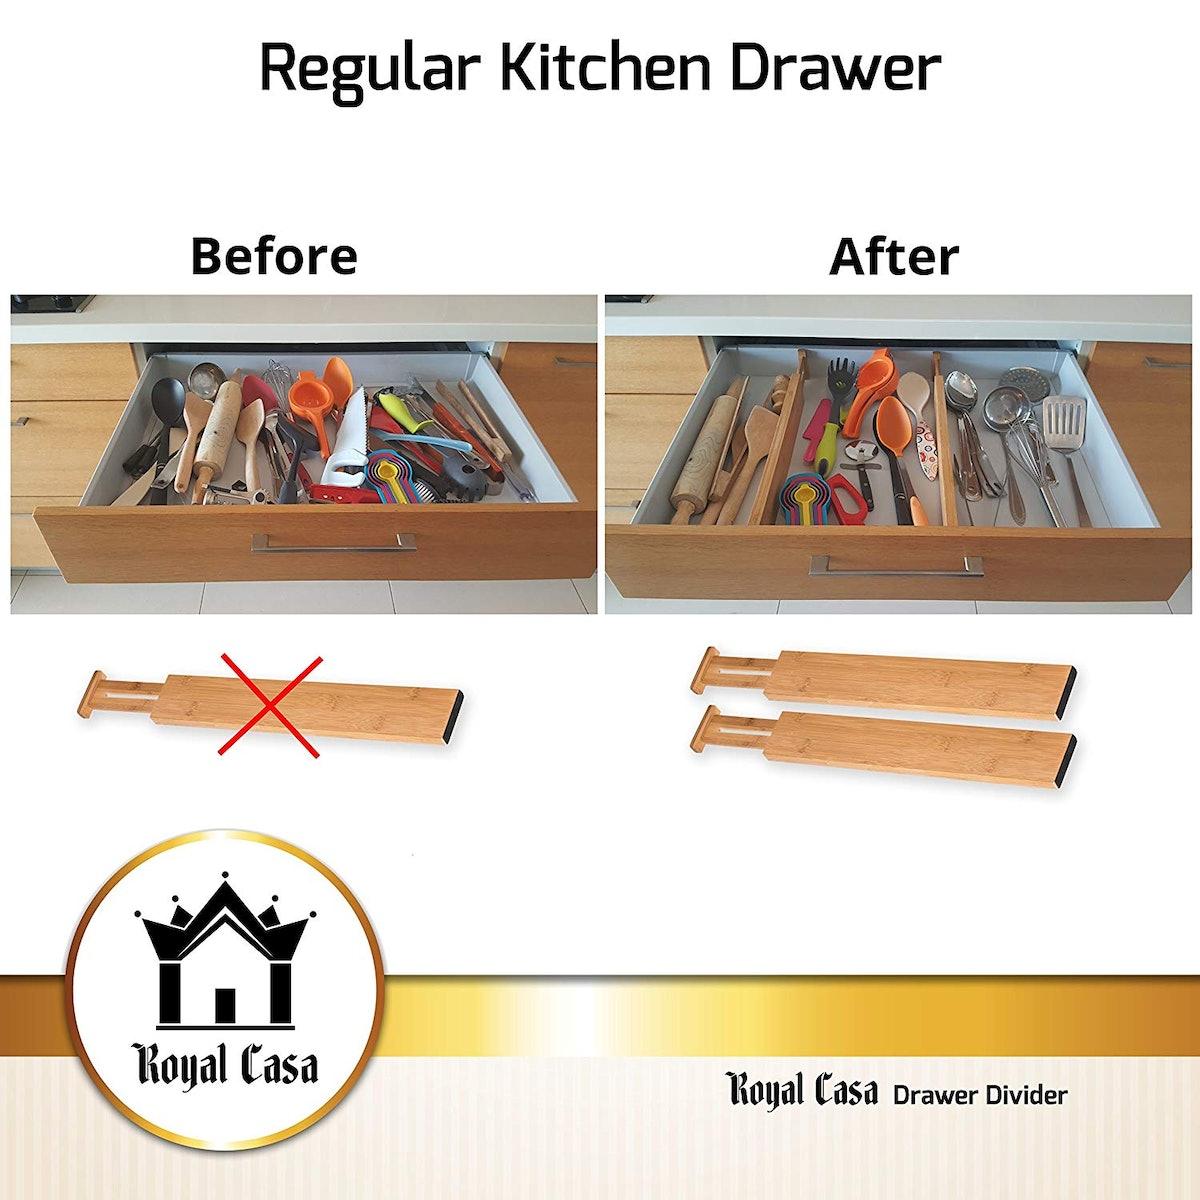 Royal Casa Drawer Dividers (4 Pack)